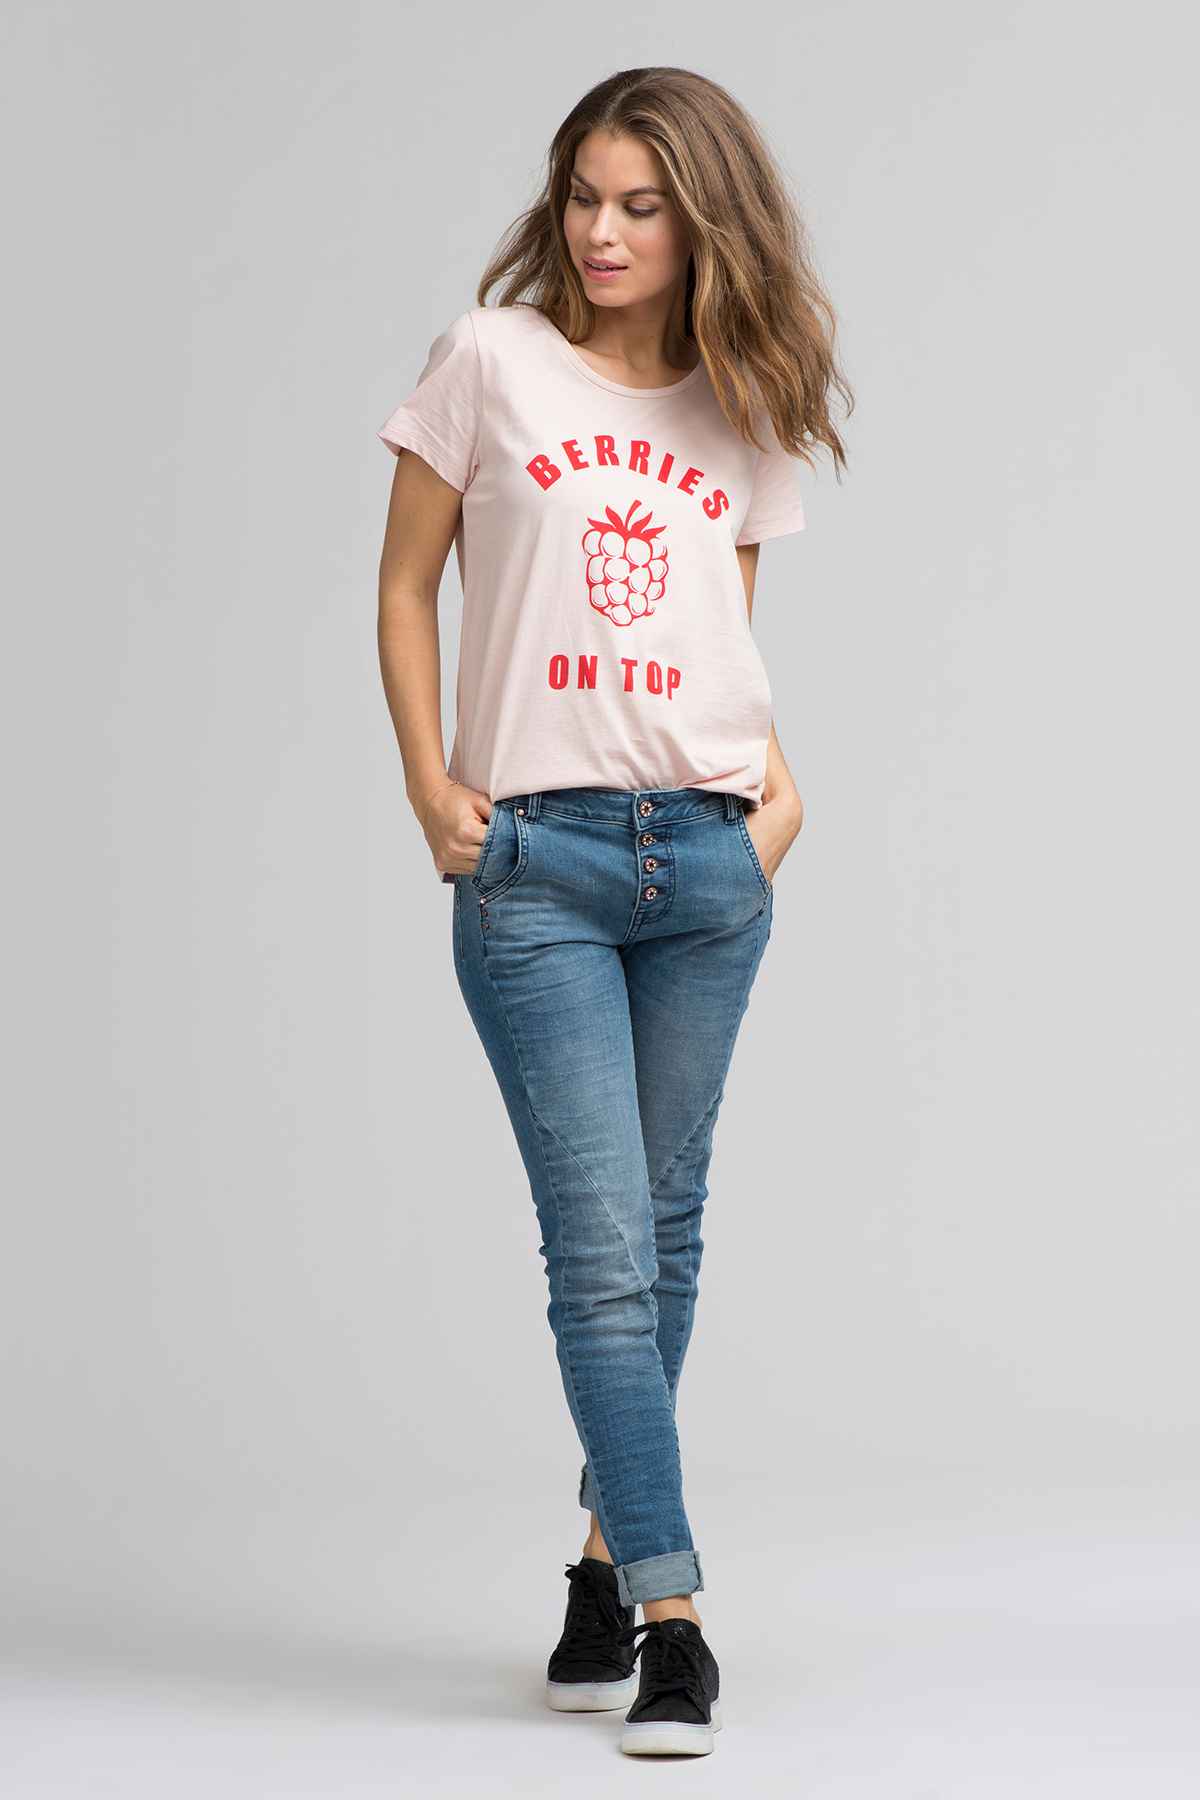 Lys rosa Kortærmet T-shirt fra Kaffe – Køb Lys rosa Kortærmet T-shirt fra str. L-XXL her